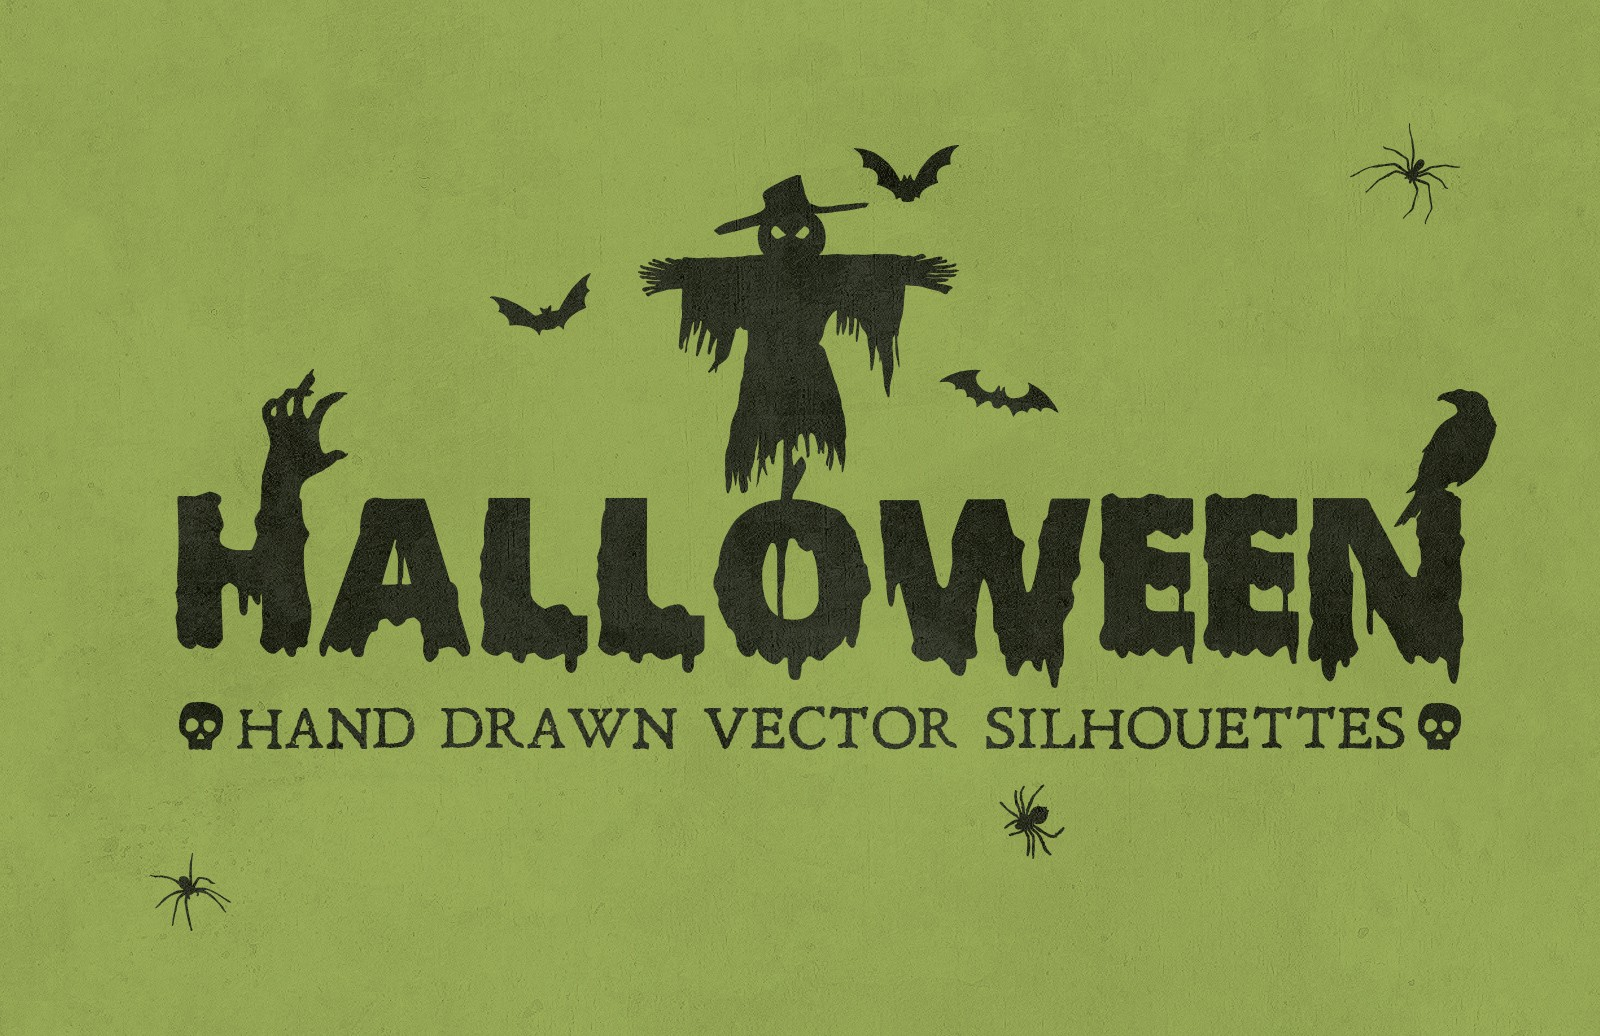 Halloween Vector Silhouettes